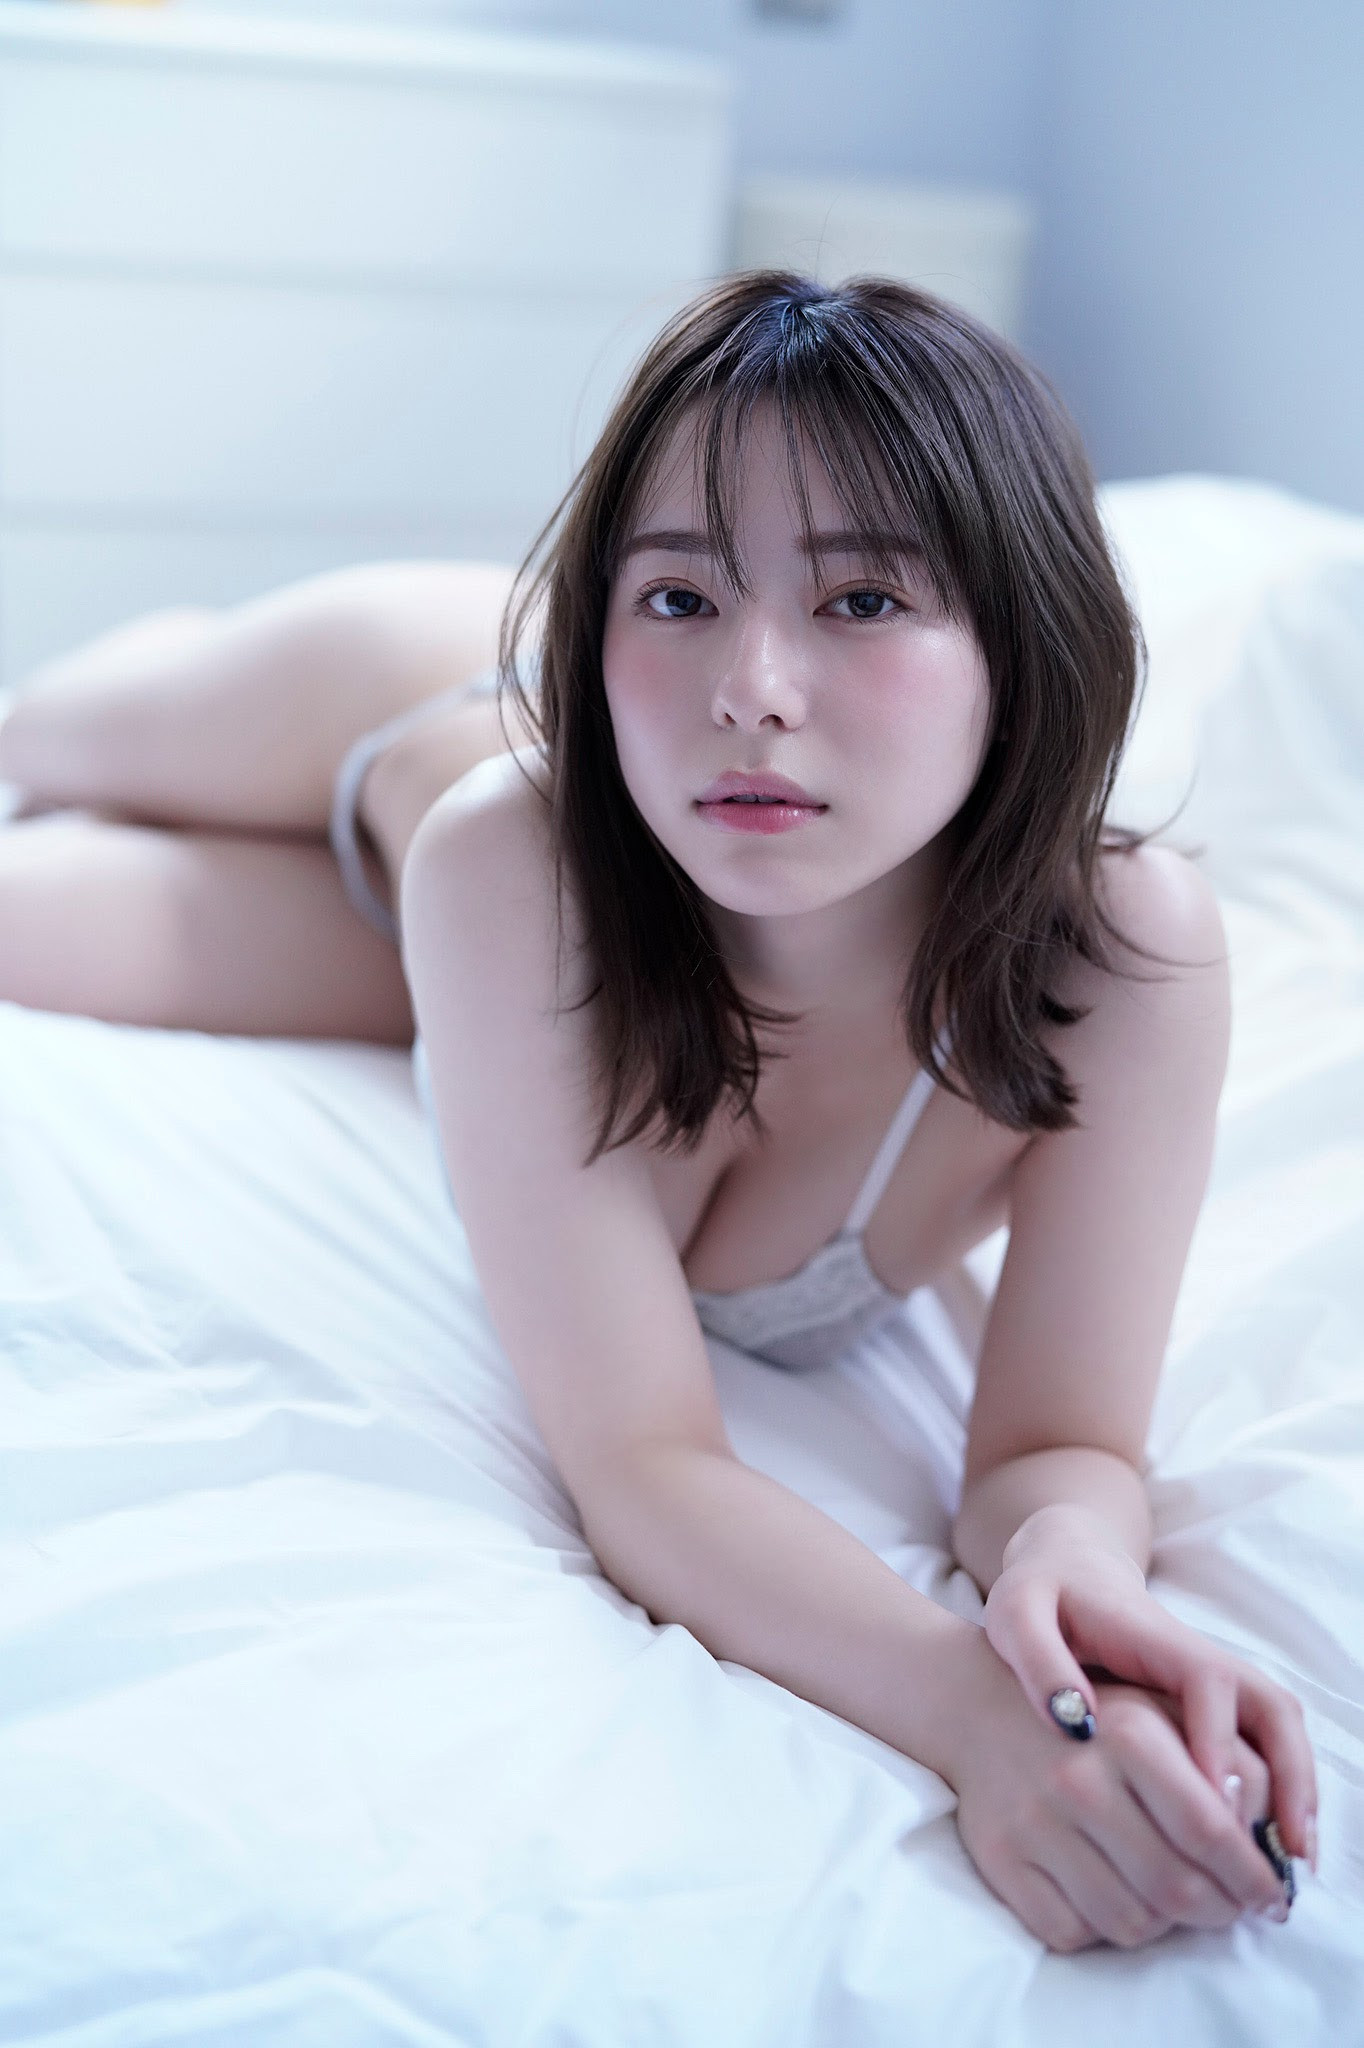 [Yanmaga Web] マーフィー波奈・ヤンマガアザーっす!020